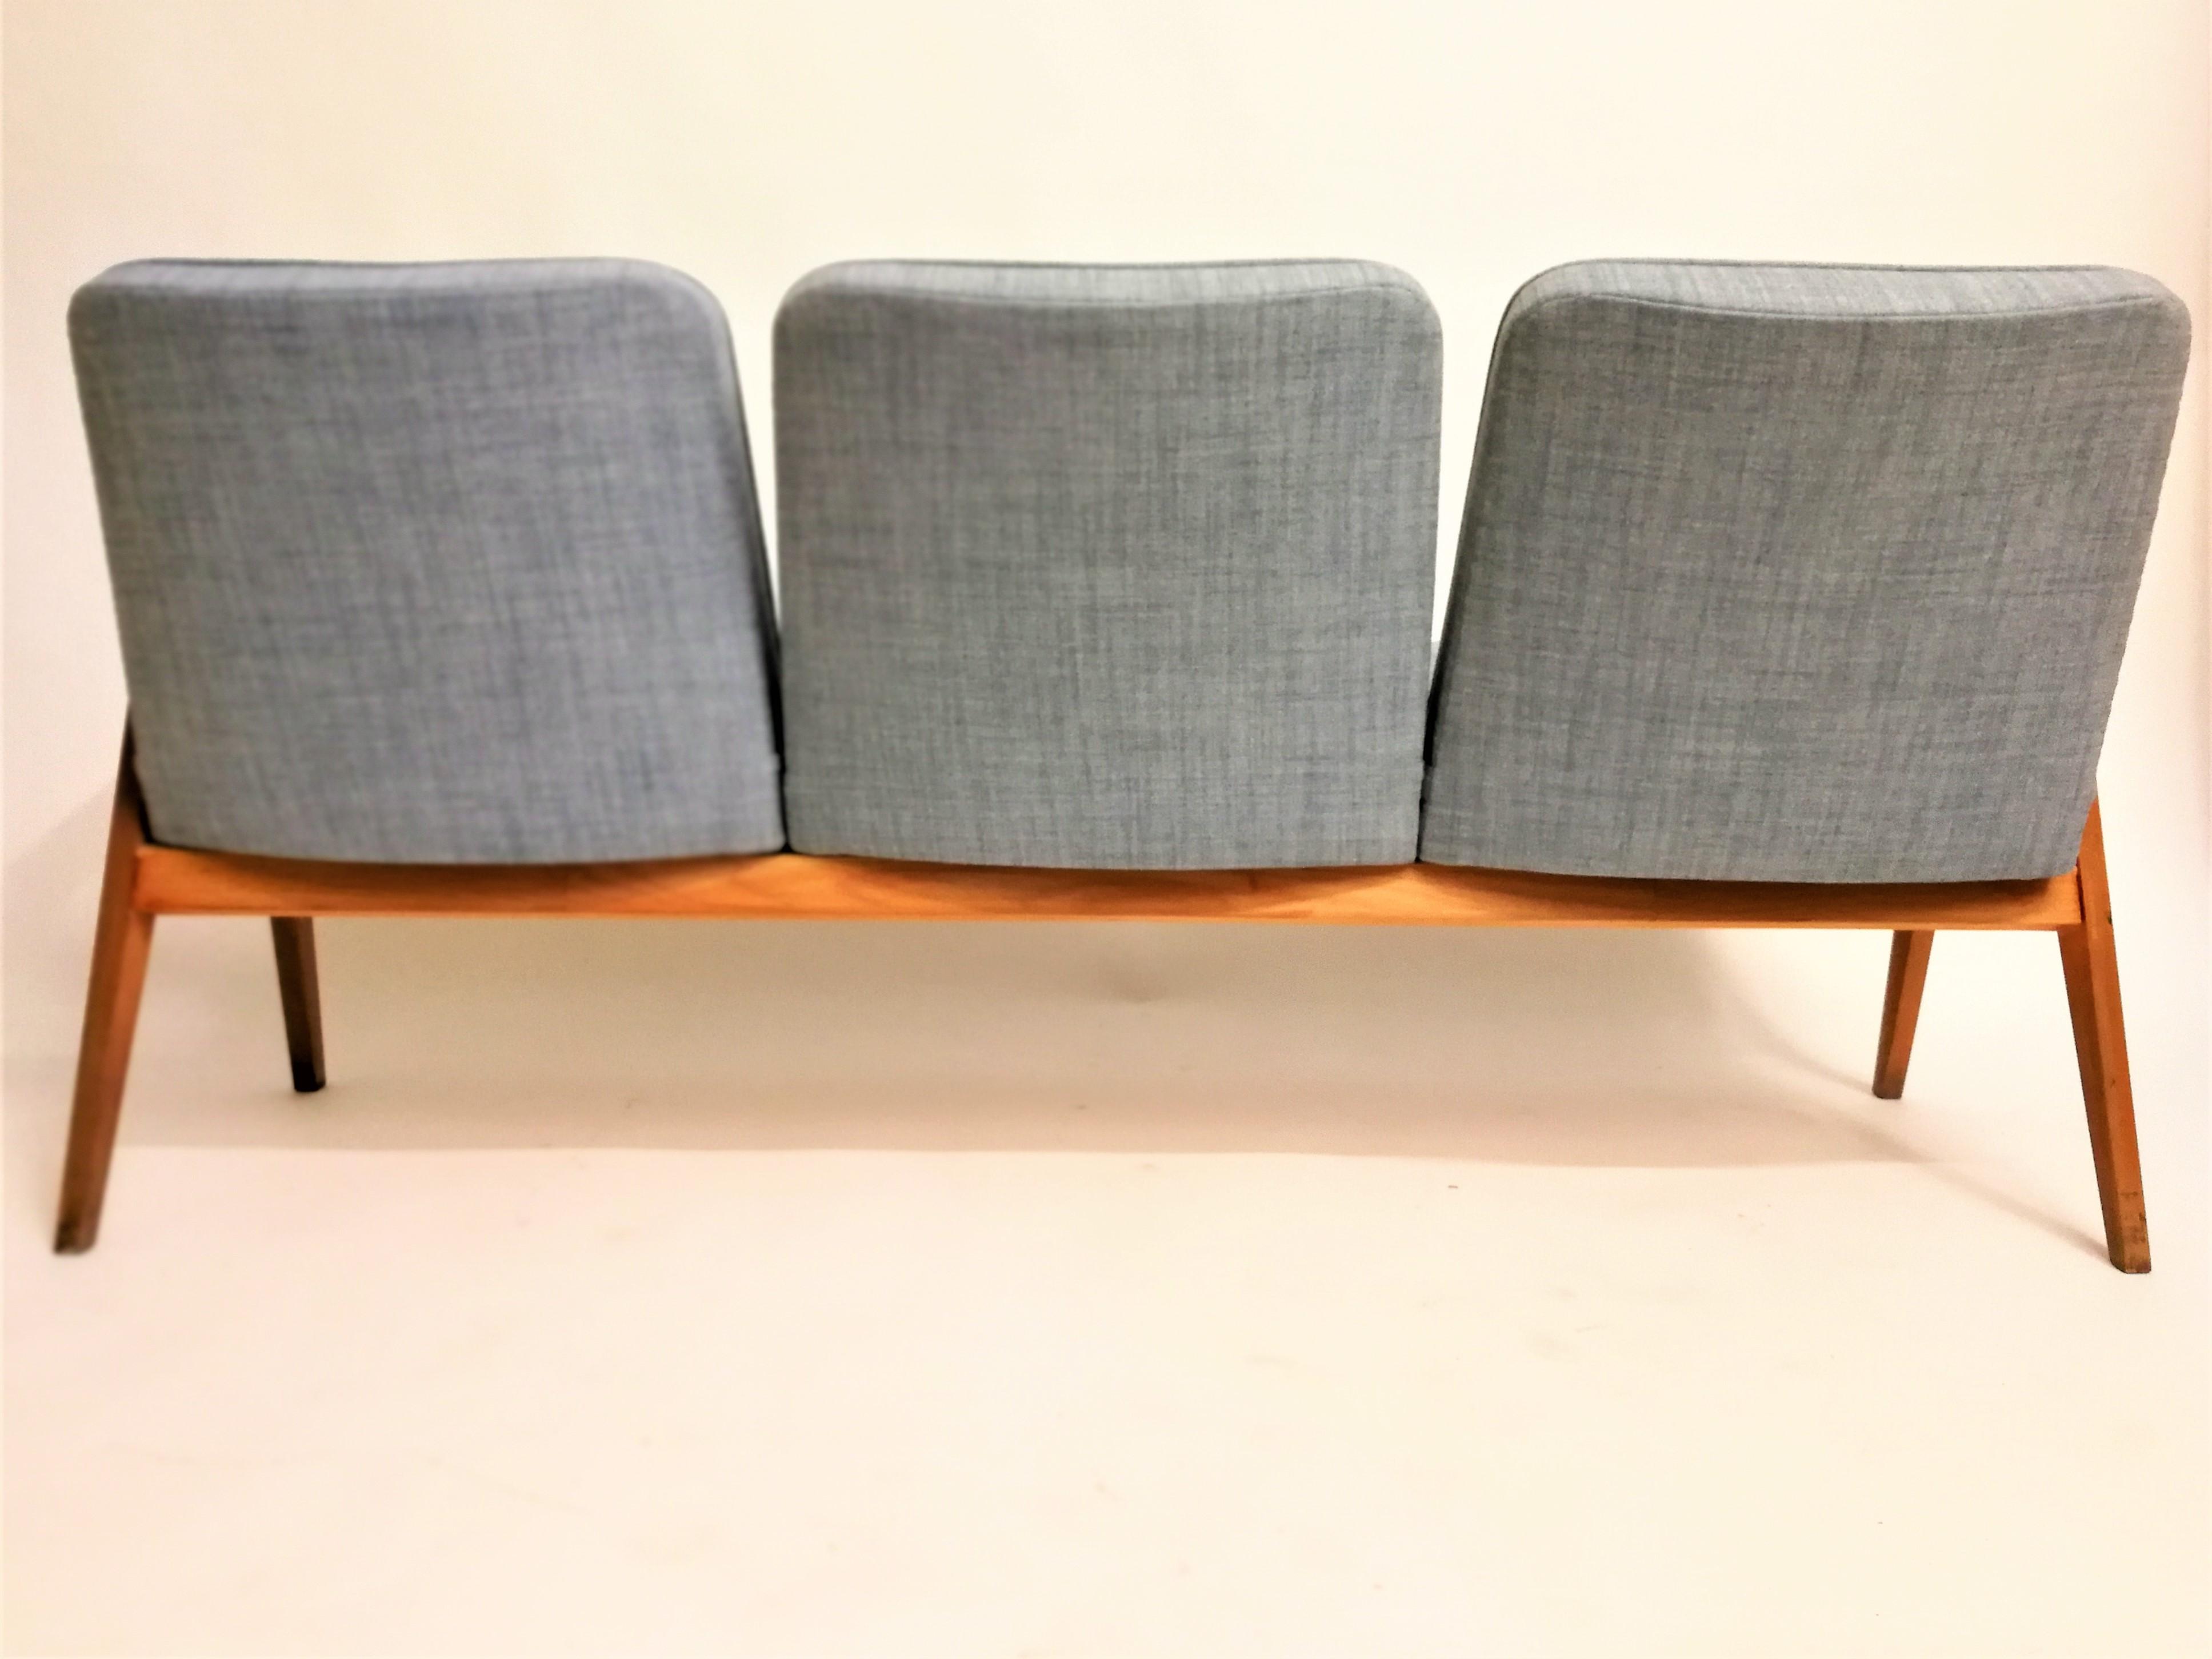 Fifties three seater Armchair